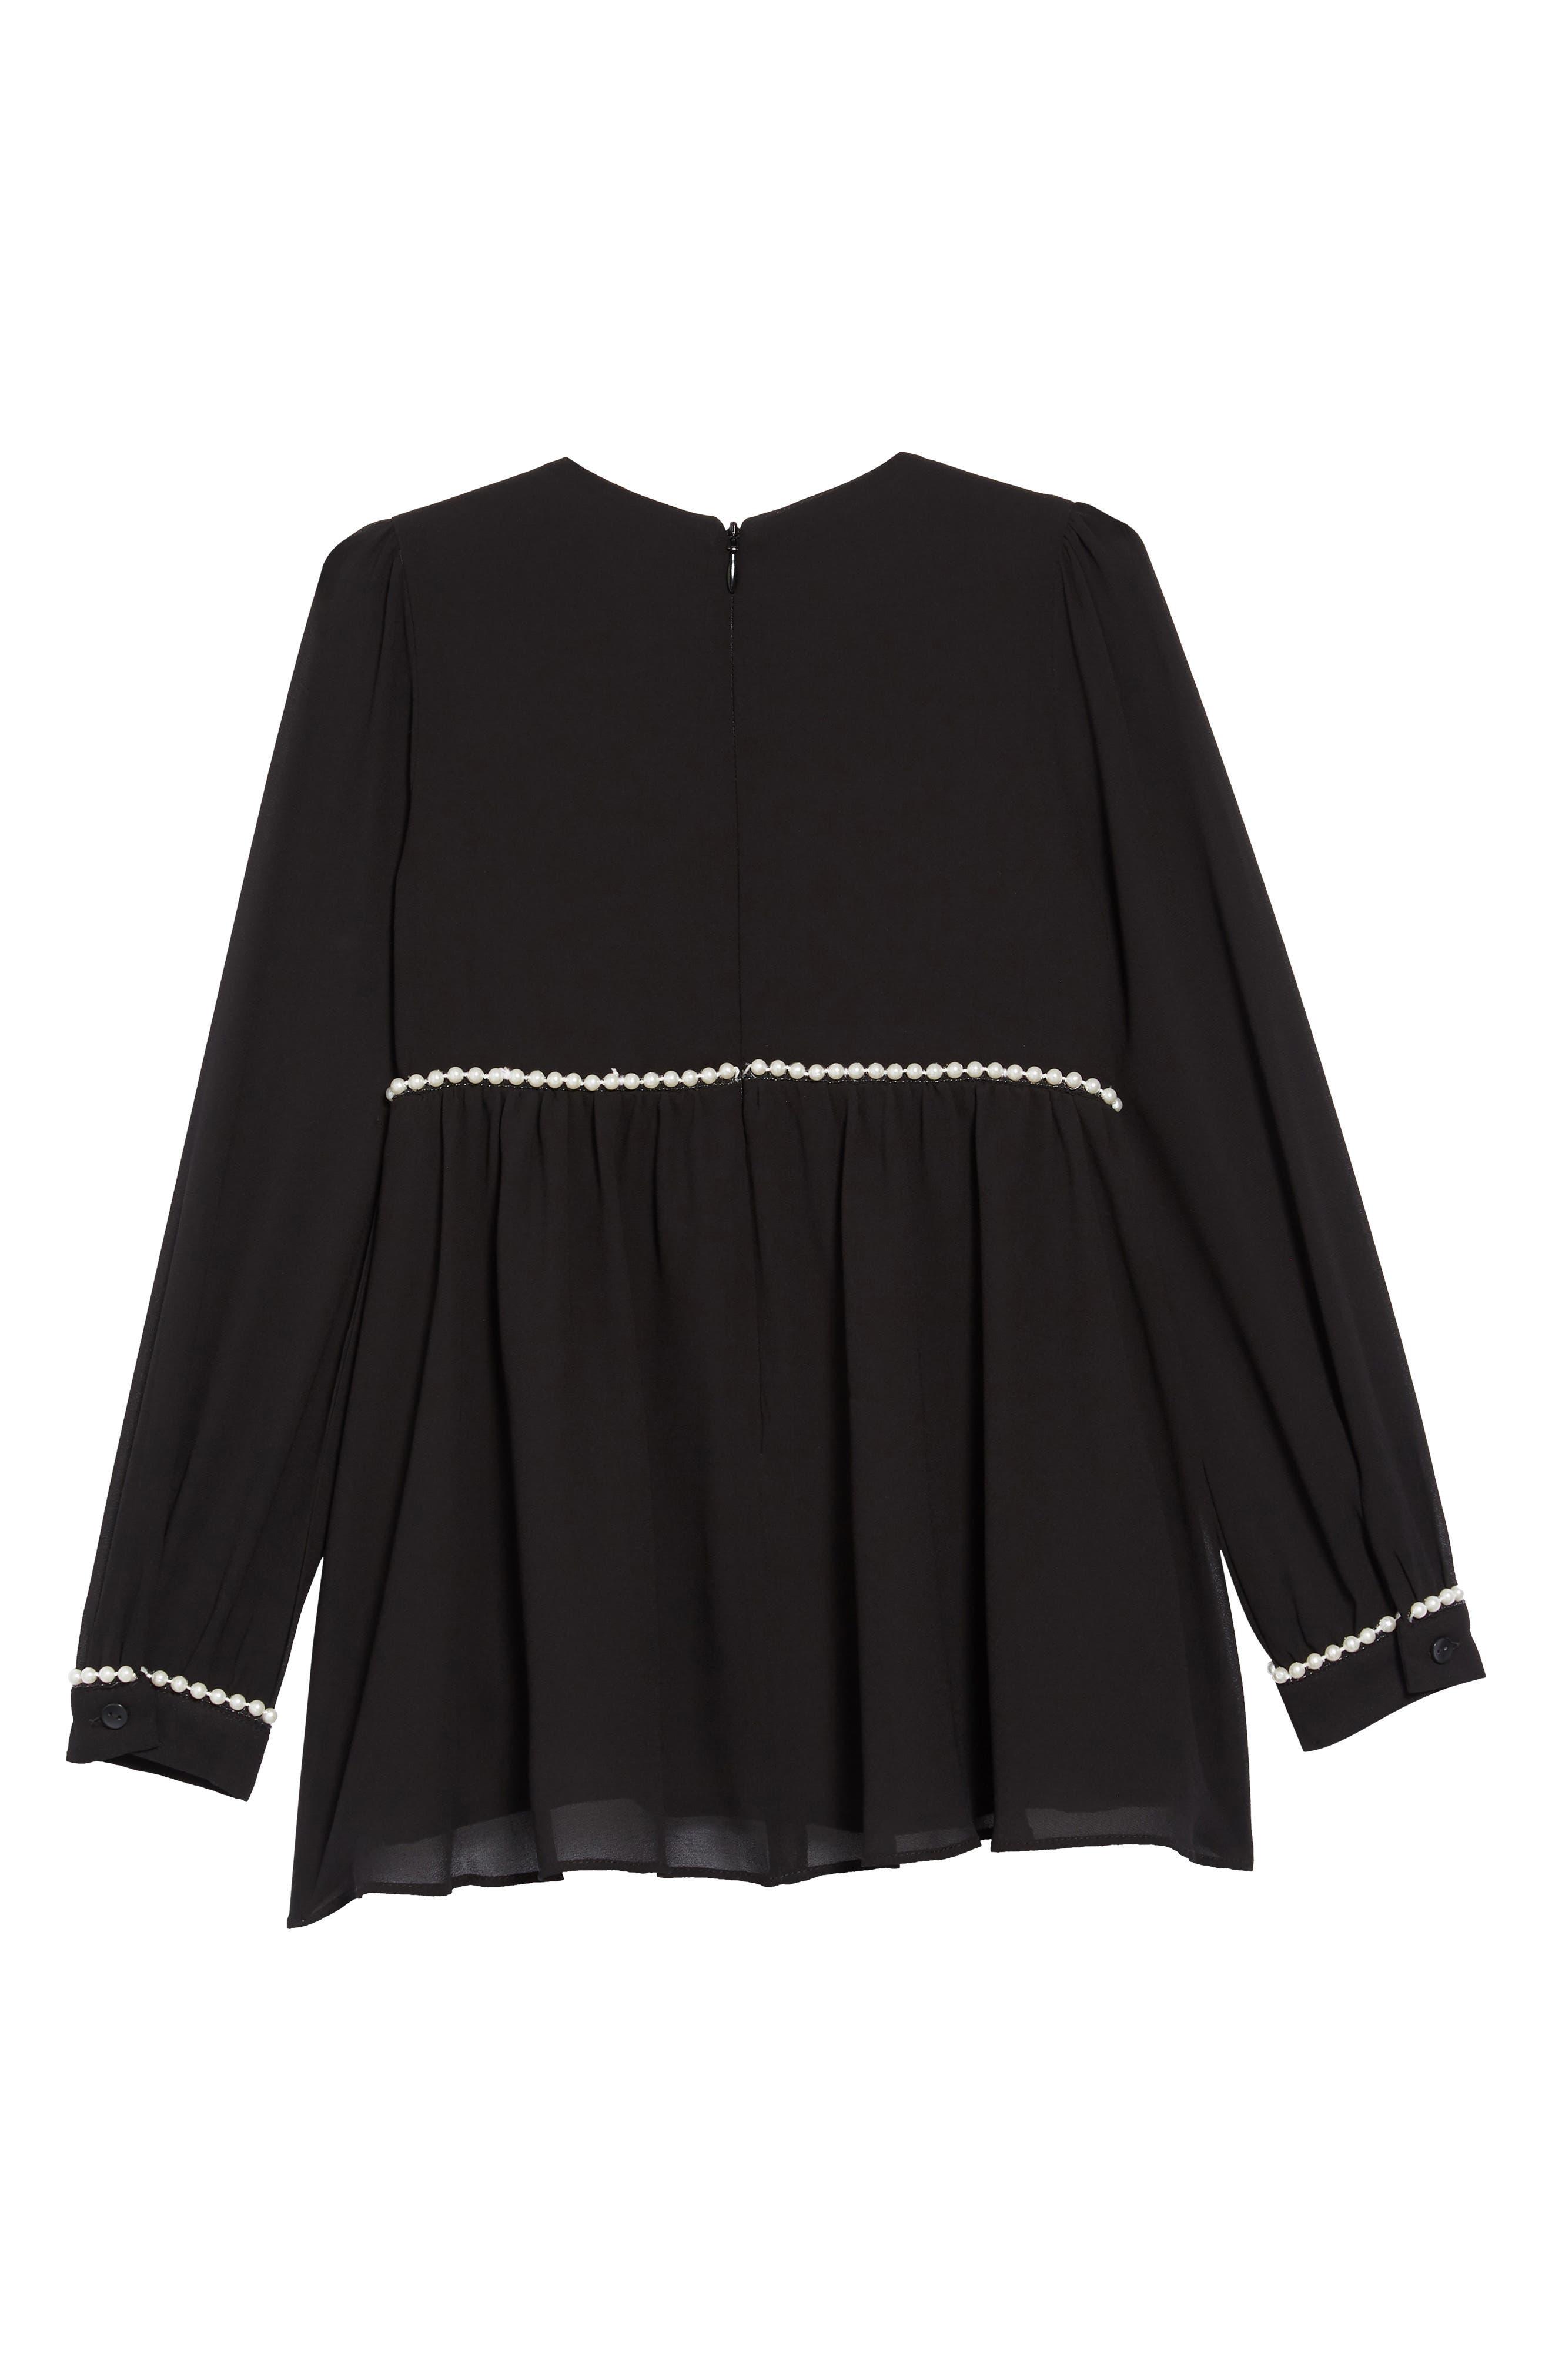 Valentina Imitation Pearl Beaded Dress,                             Alternate thumbnail 2, color,                             BLACK